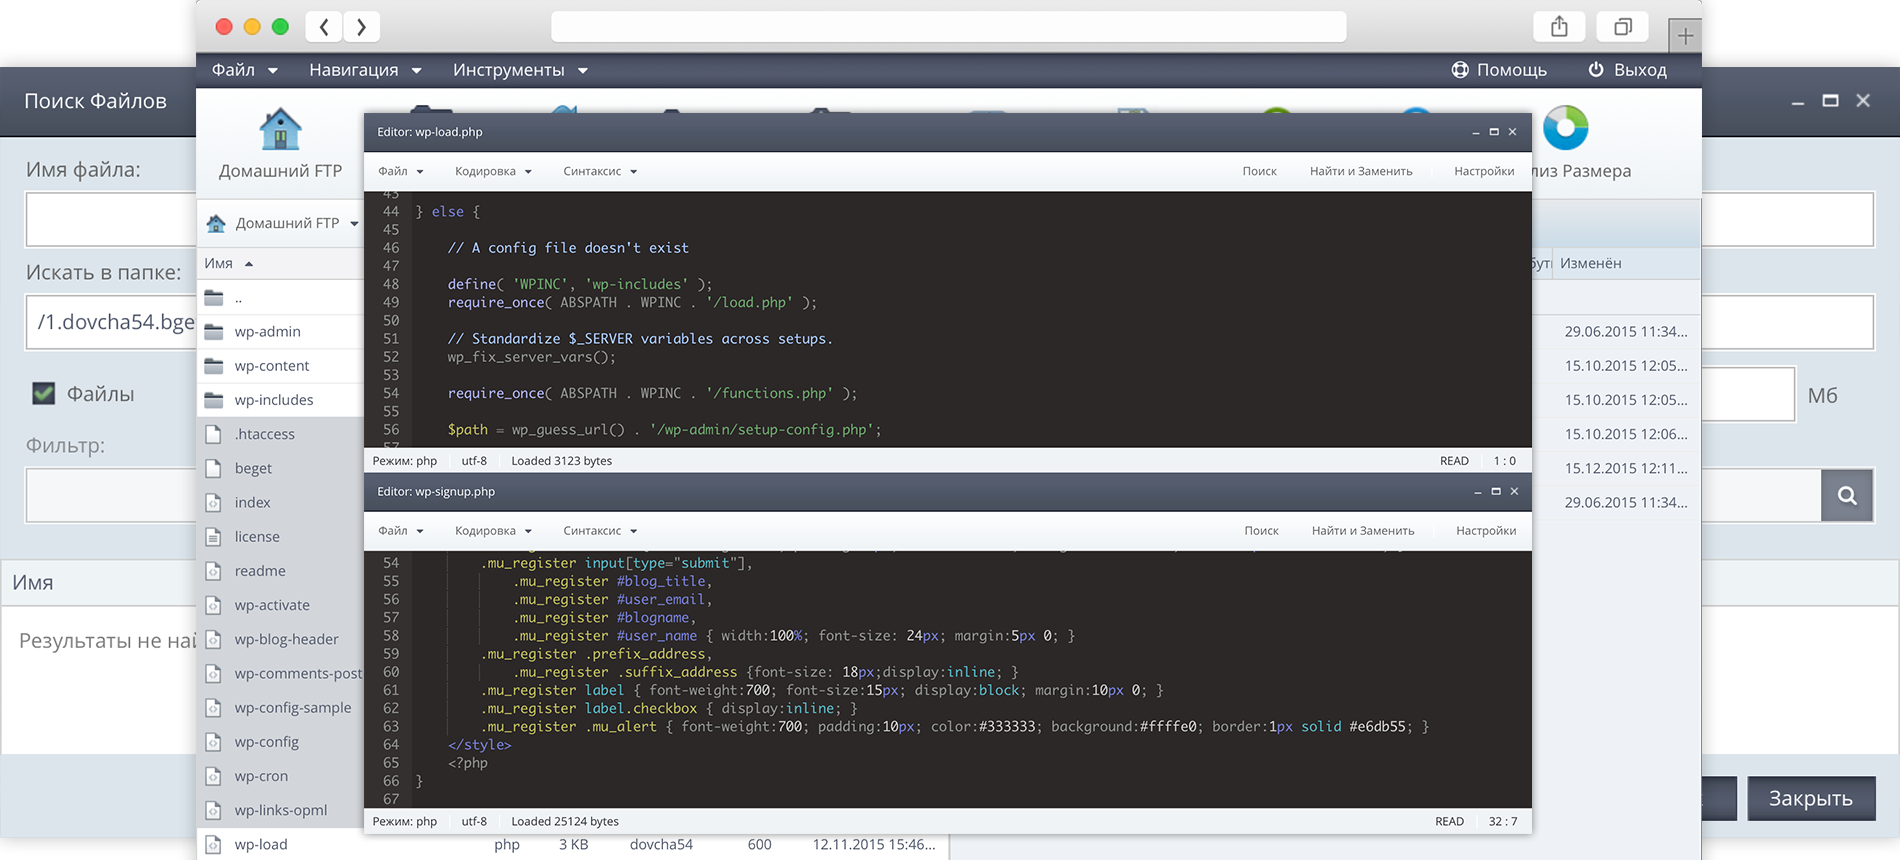 SPRUT io - Web File Manager